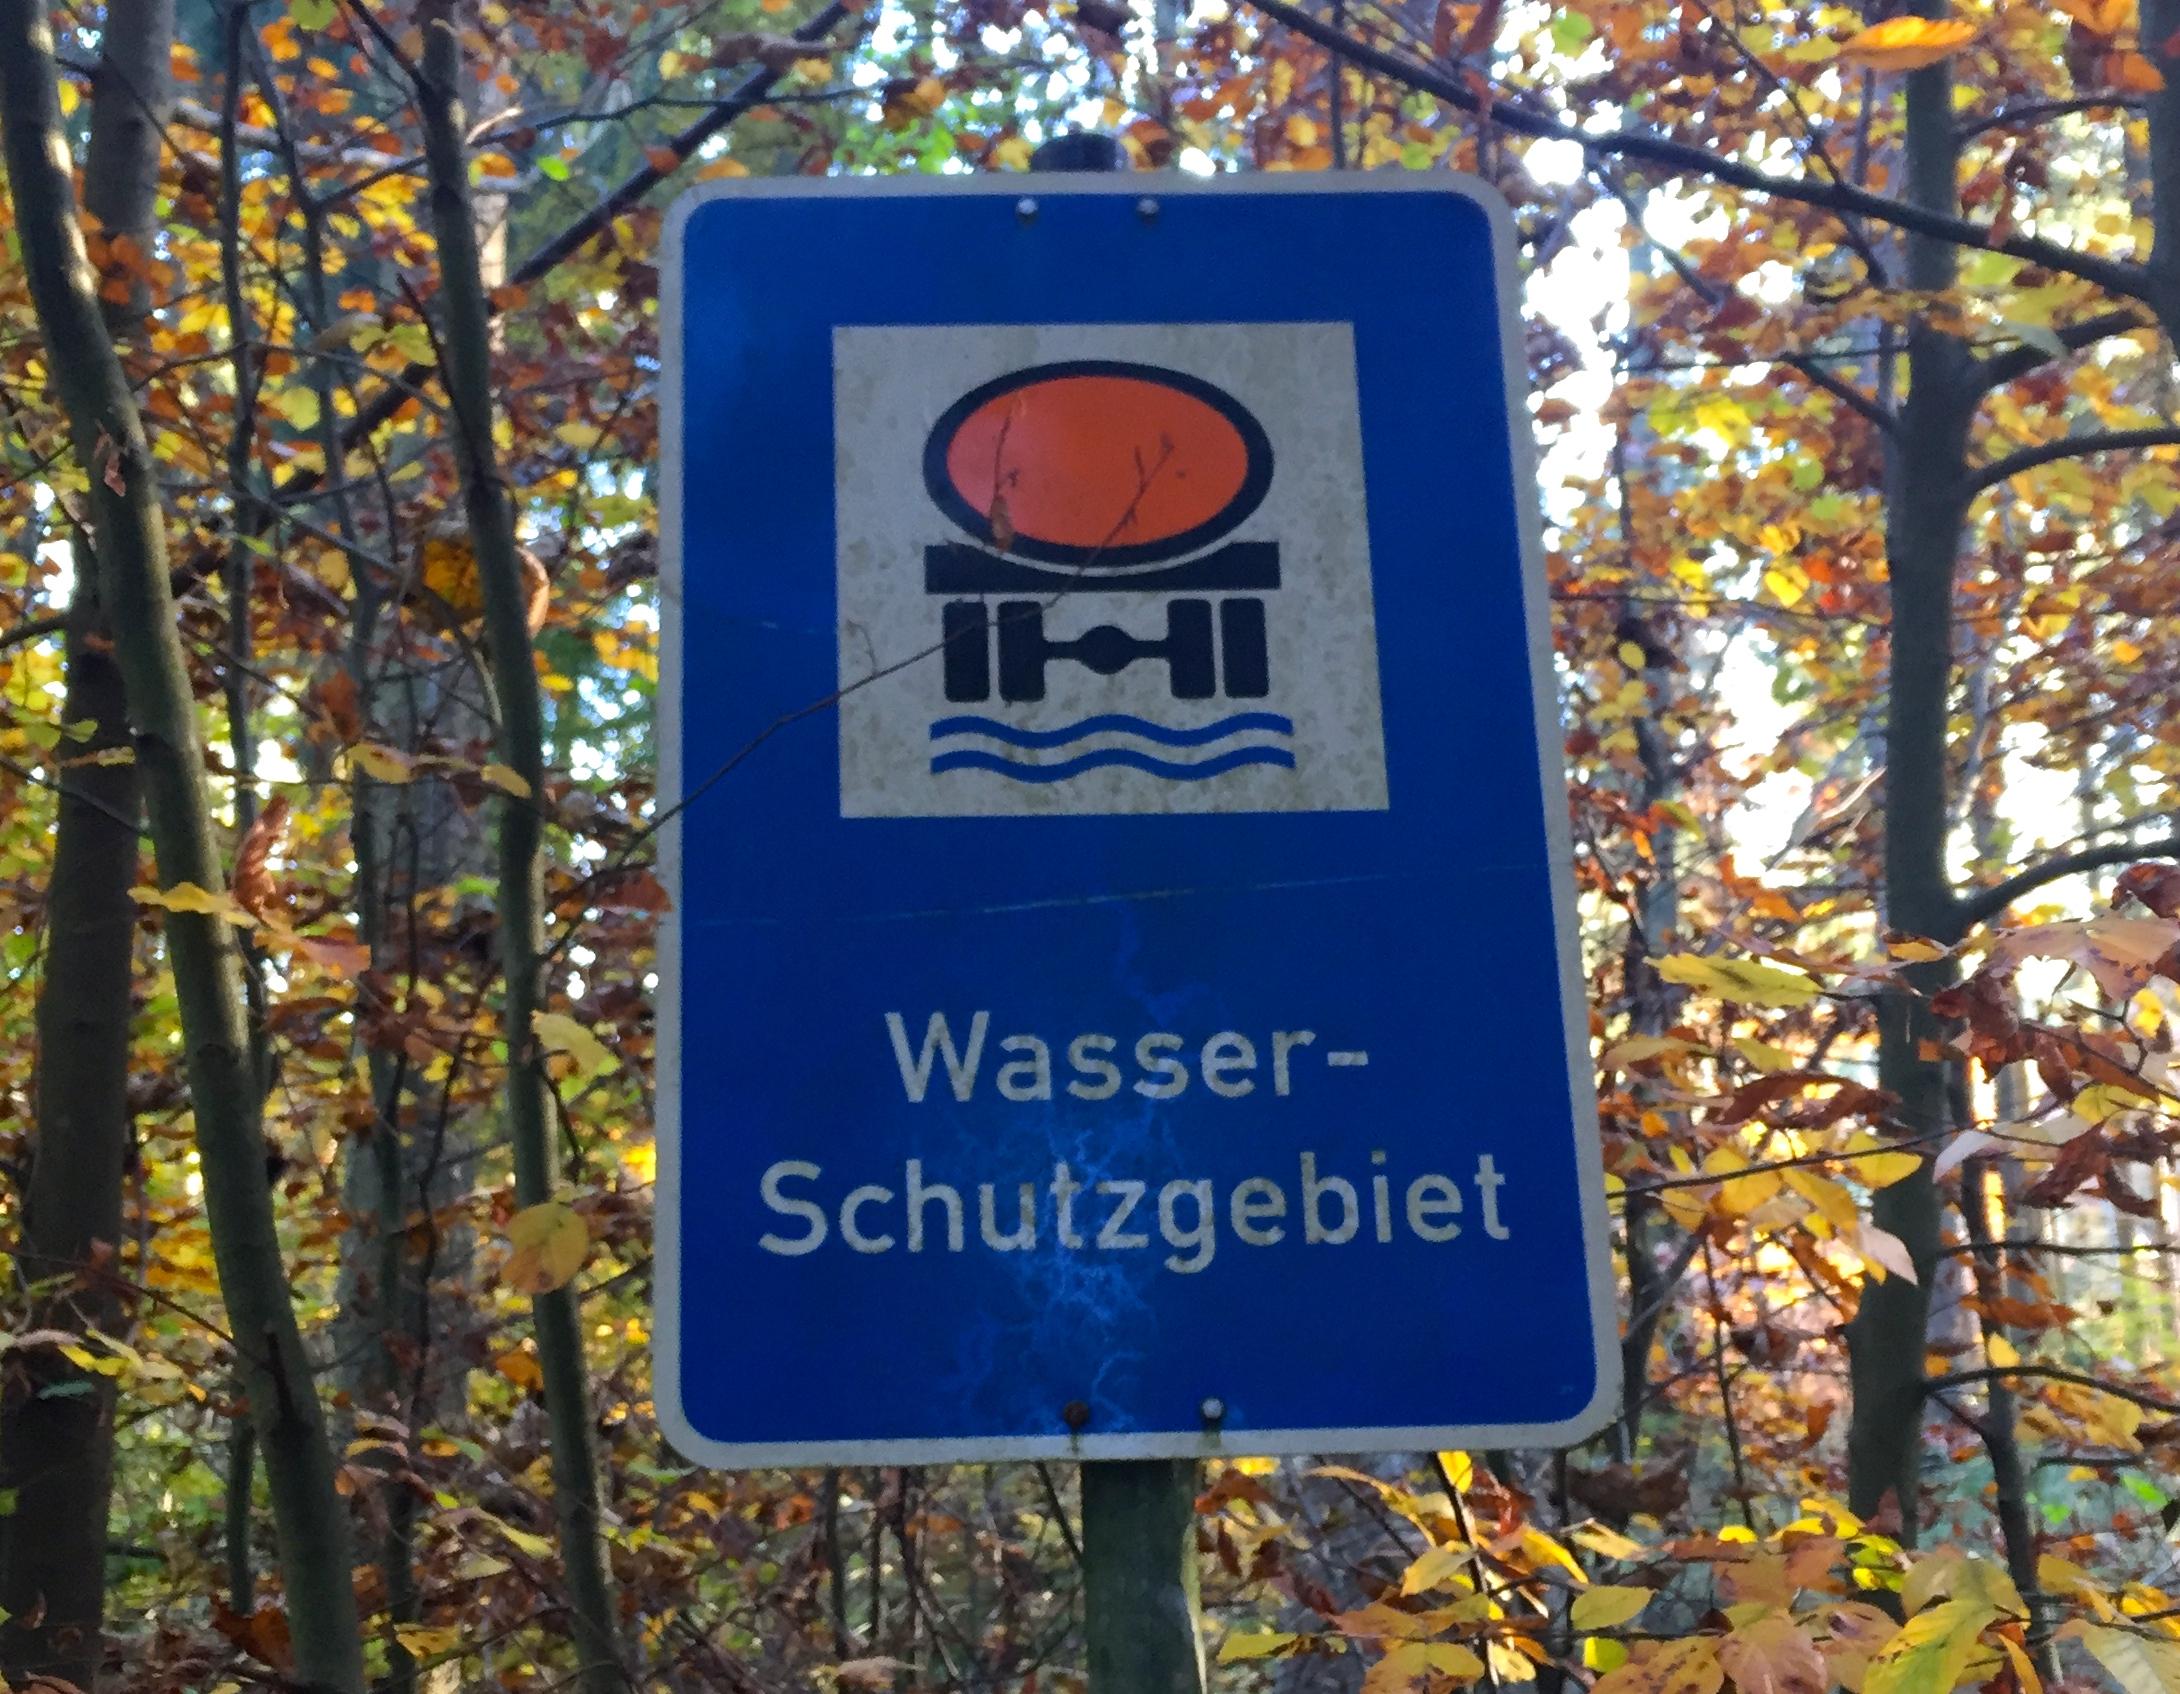 Wasserschutzgebiet Brunnen